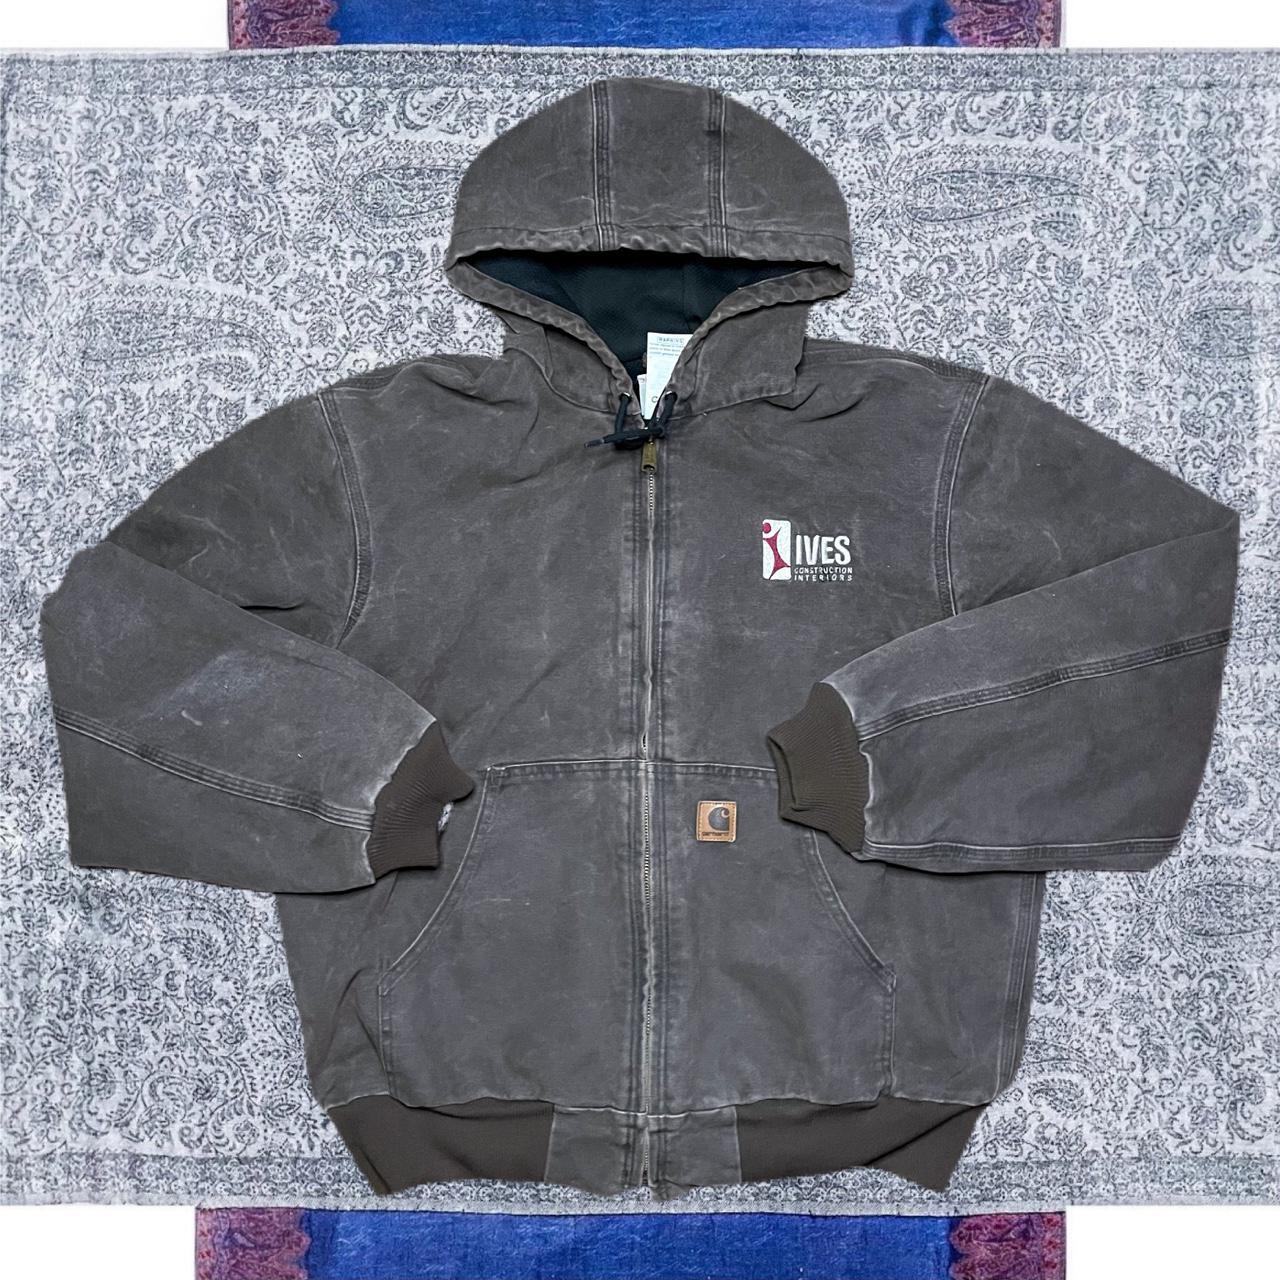 Product Image 1 - Carhartt Jacket   - Adult L -